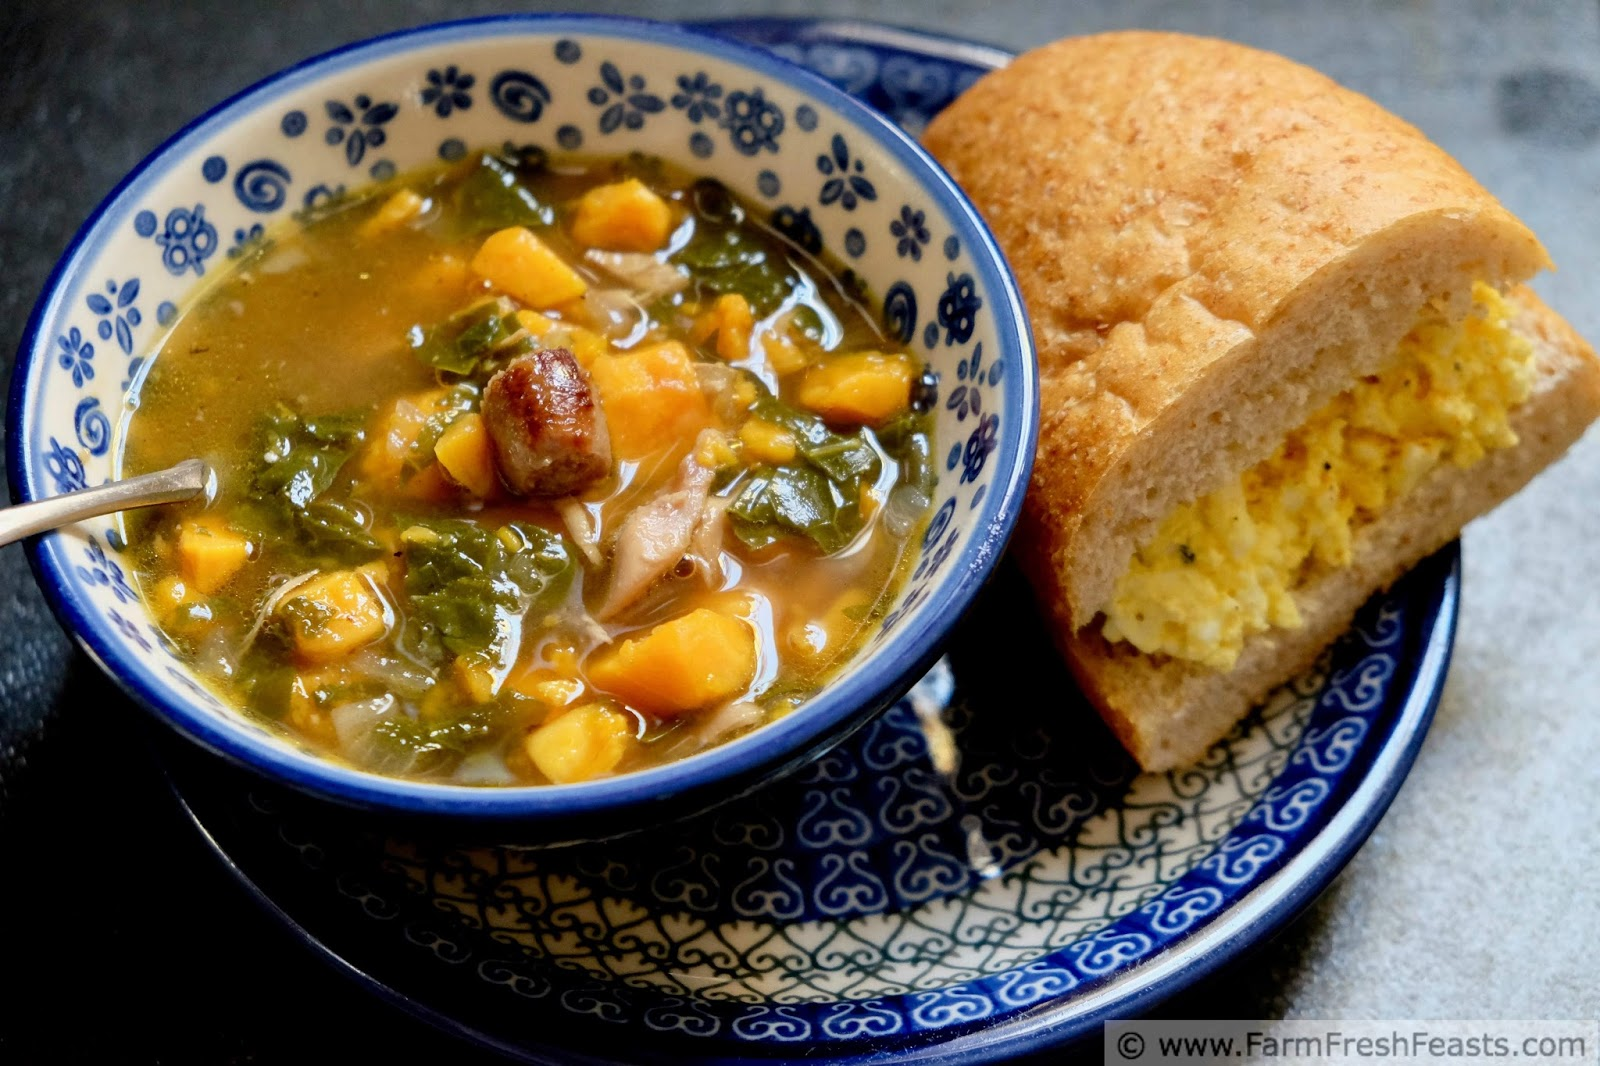 Farm Fresh Feasts: Chicken, Sweet Potato, and Kale Soup